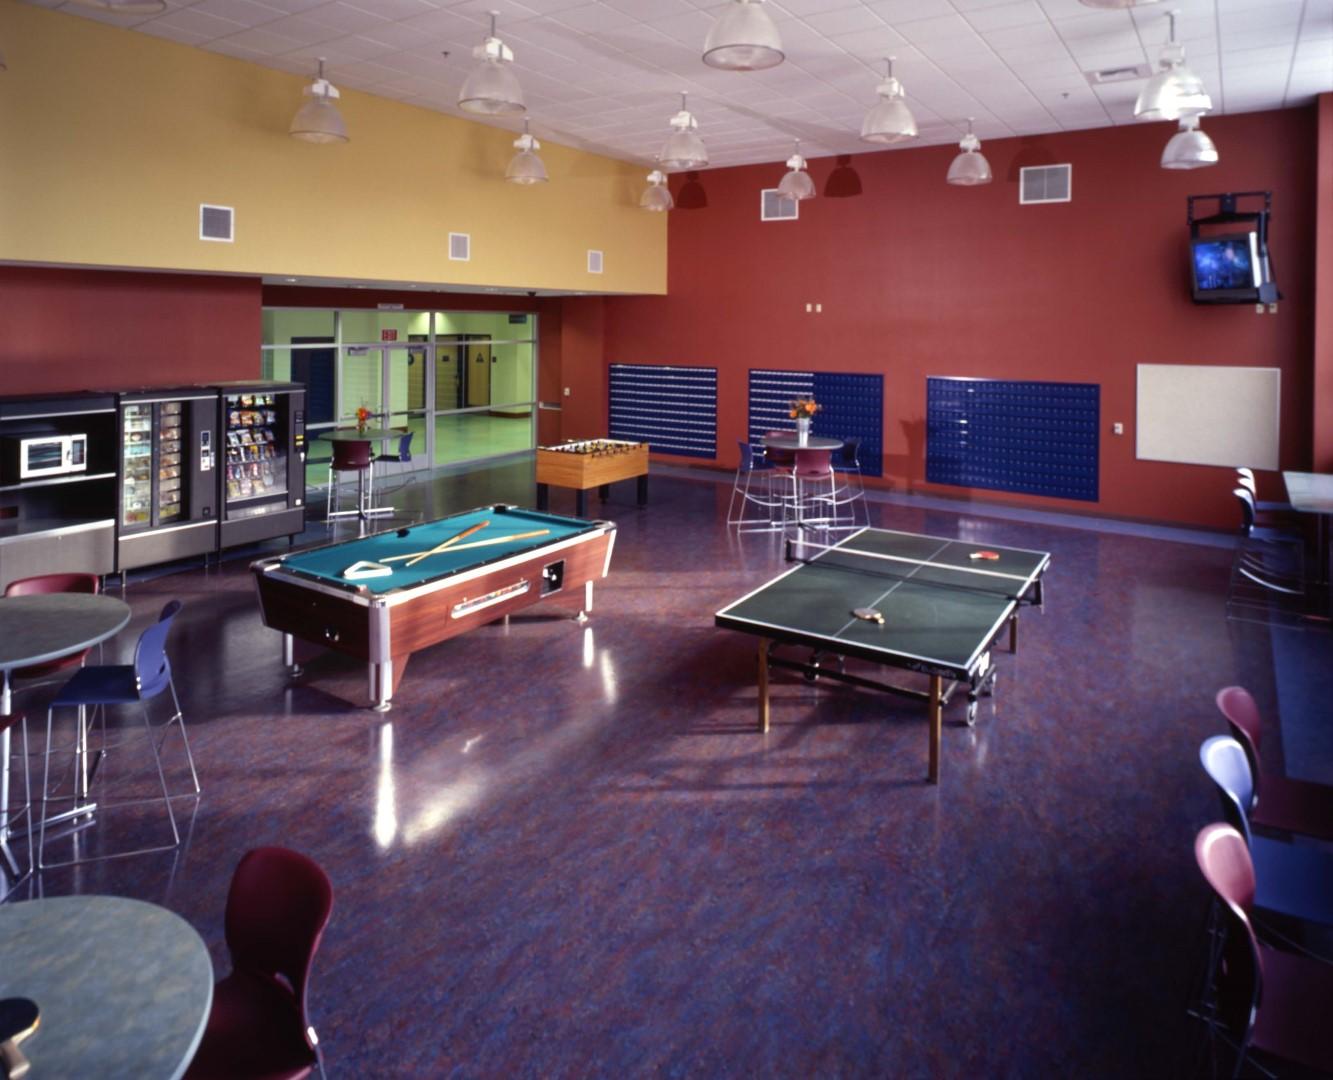 5 Hope International University, Gymnasium_Student Center (Student Lounge), Fullerton, CA